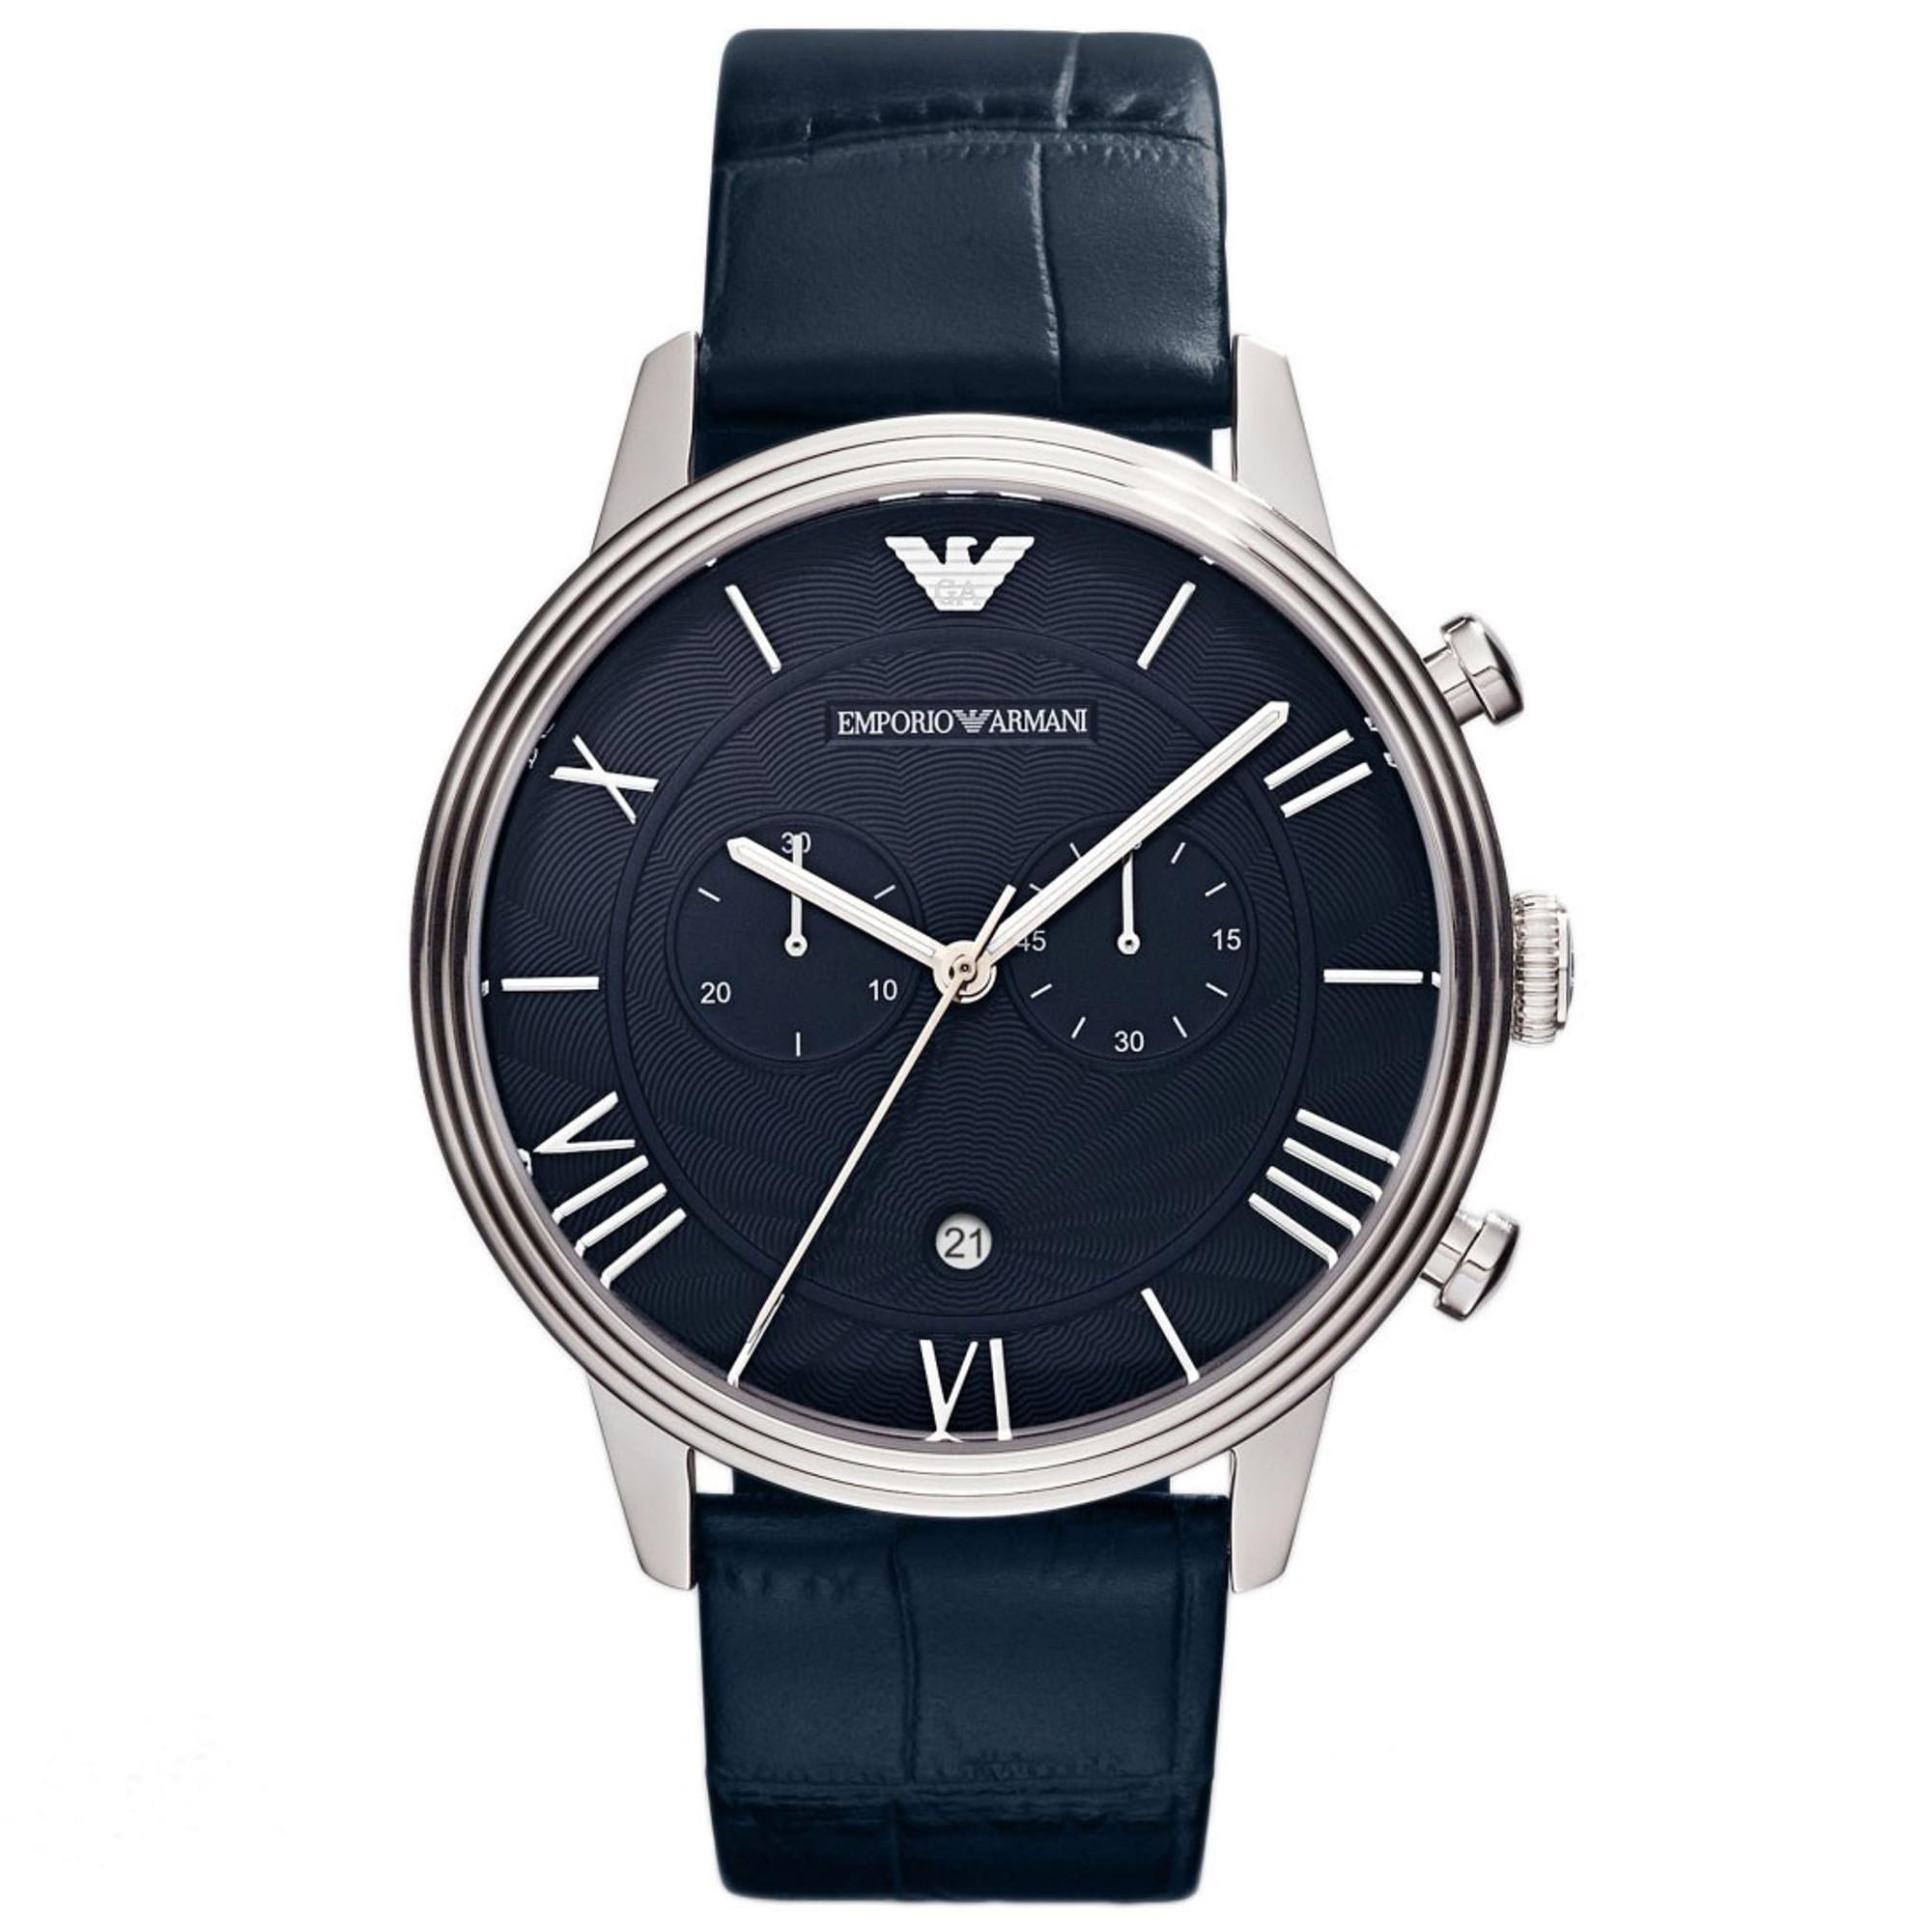 EMPORIO ARMANI Classic Watch Chronograph AR1652